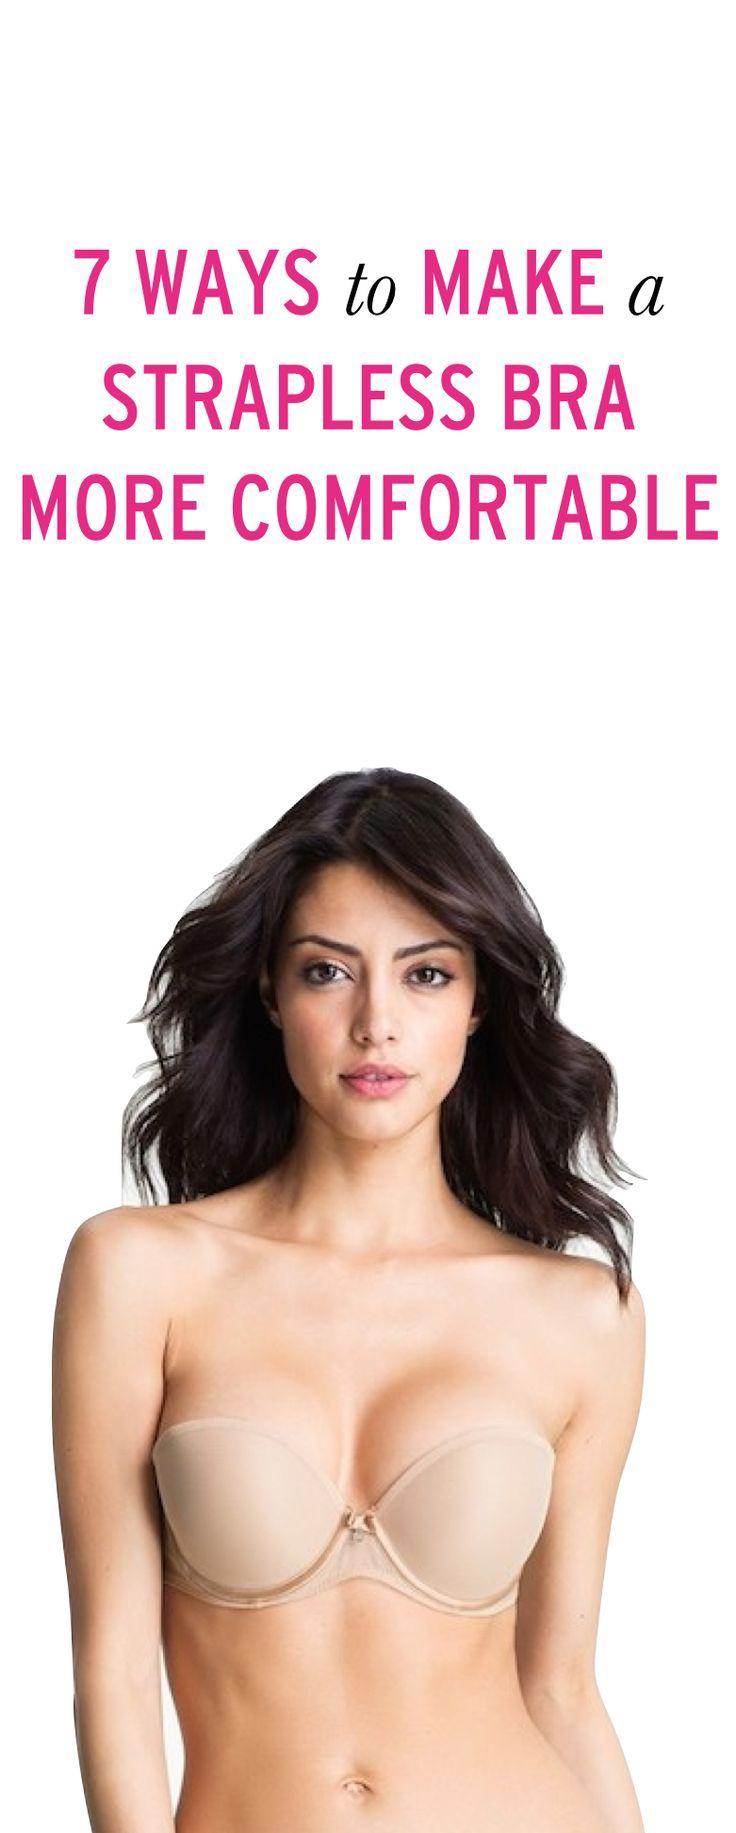 6c889c572efe0 7 Ways to Make a Strapless Bra Less Annoying